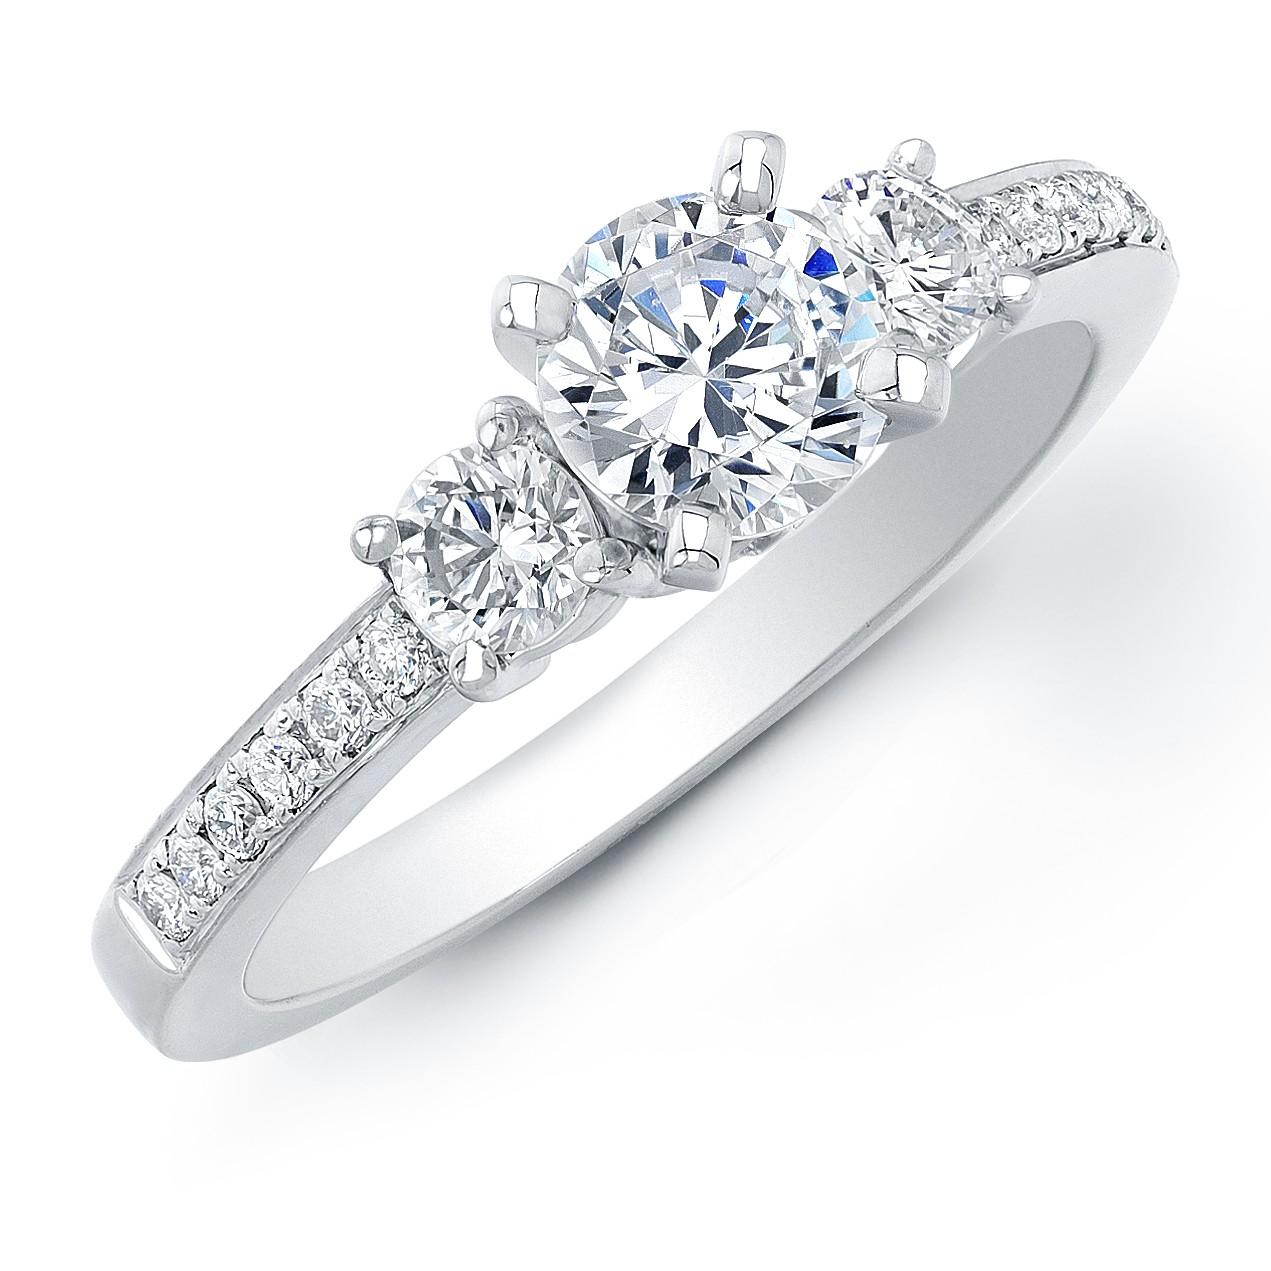 1Ct TW Diamond ThreeStone Engagement Ring